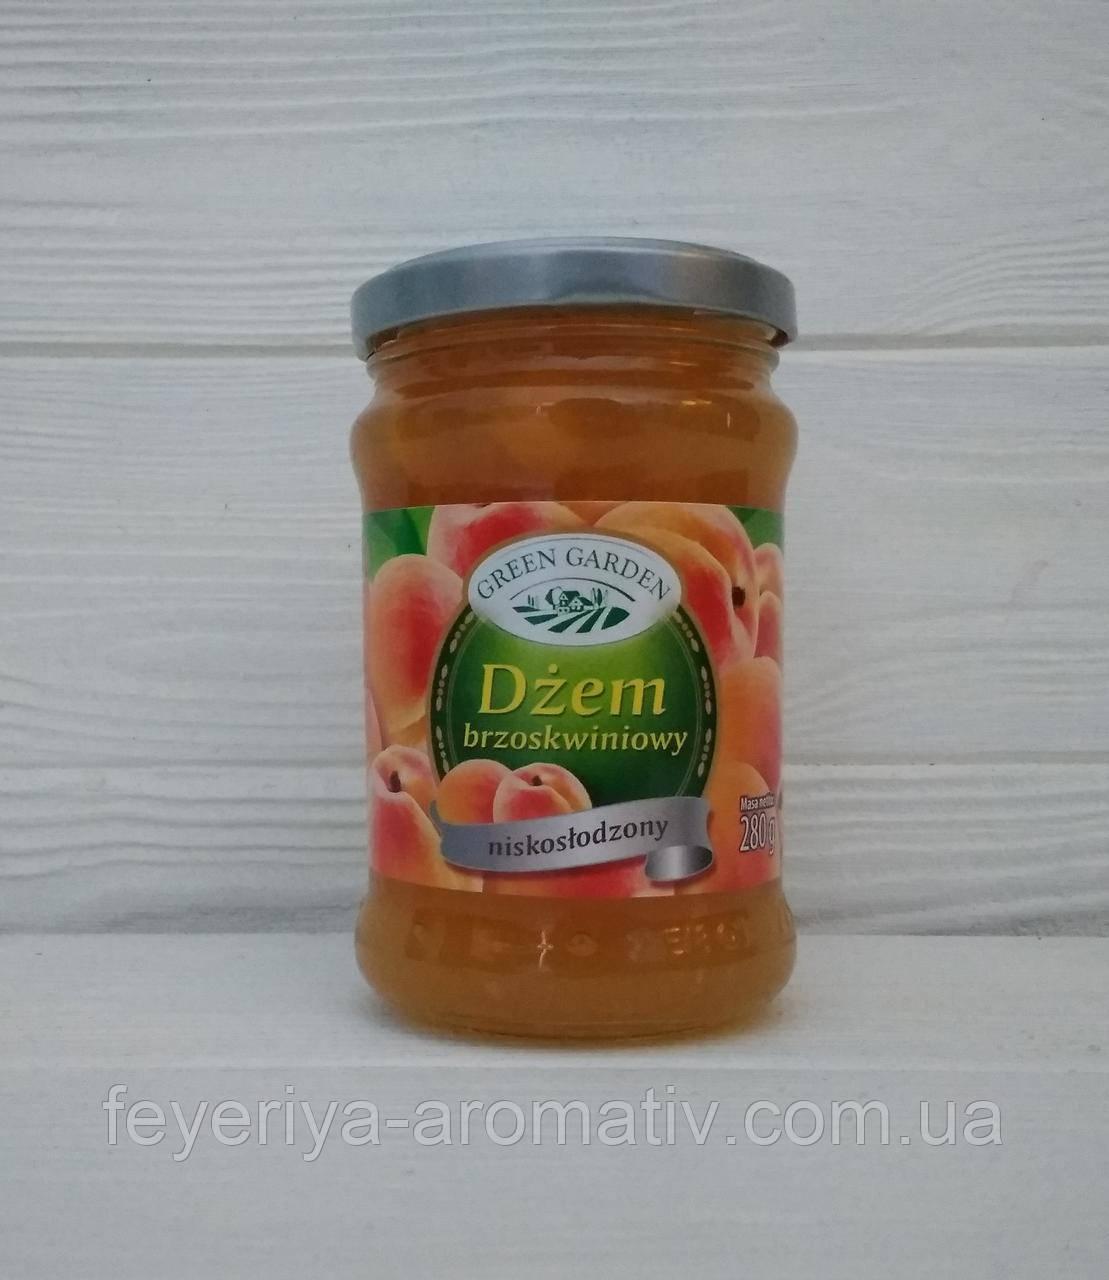 Персиковый джем Green Garden Brzoskwiniowy niskolodzony 280гр (Польша)